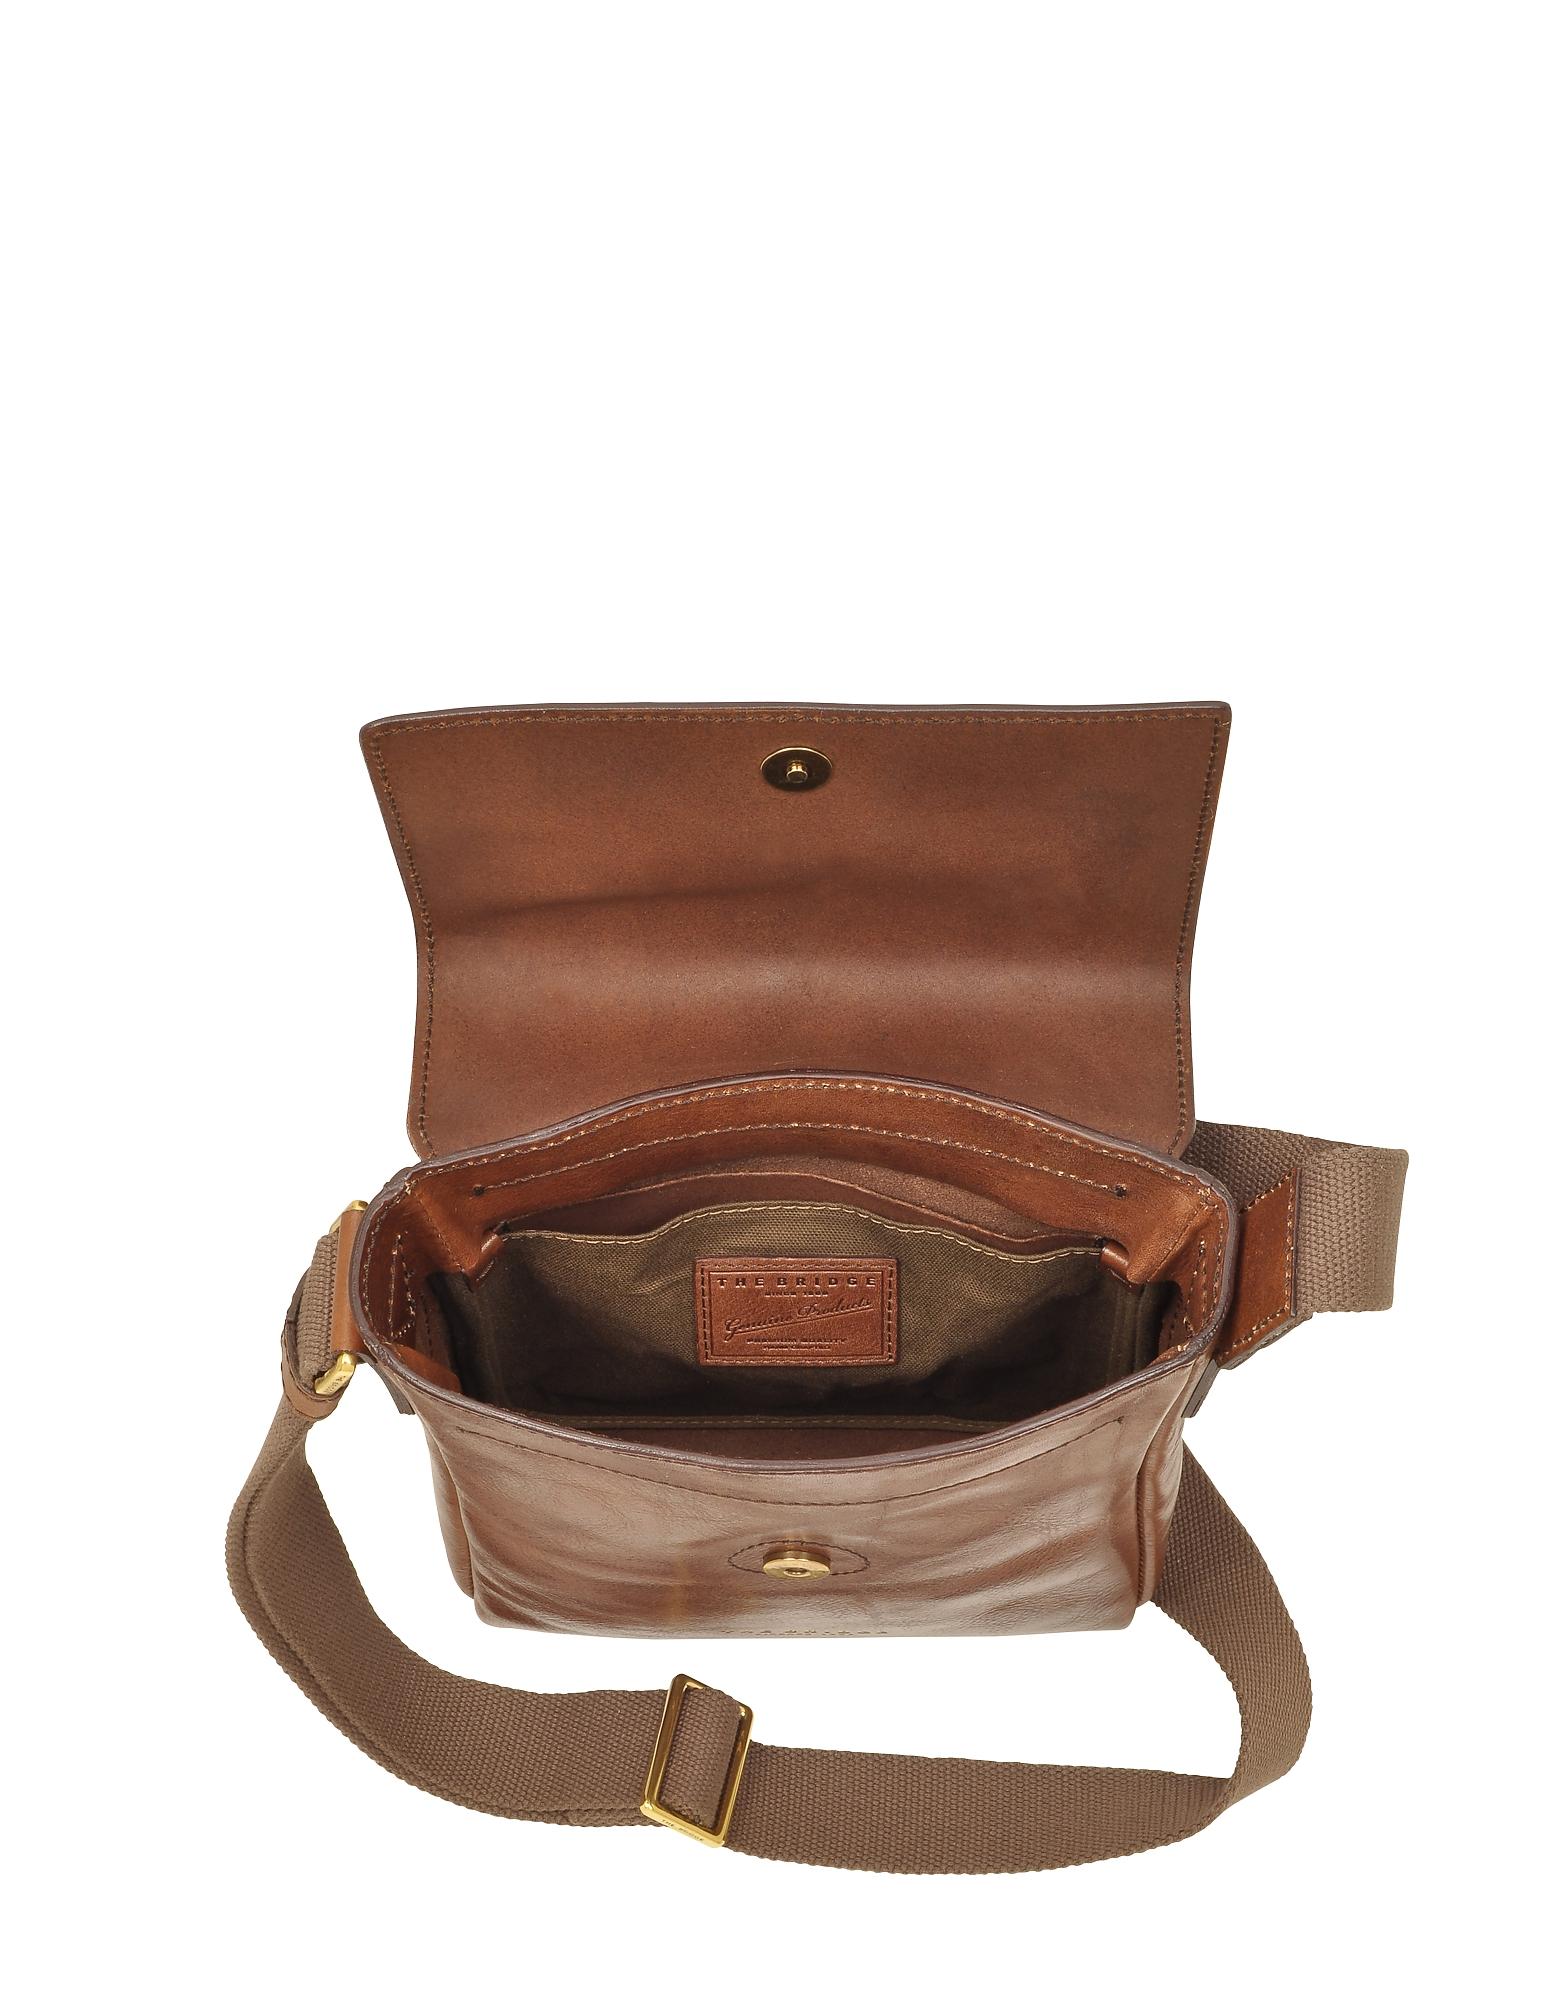 Sfoderata Marrone Leather Men's Crossbody Bag от Forzieri.com INT